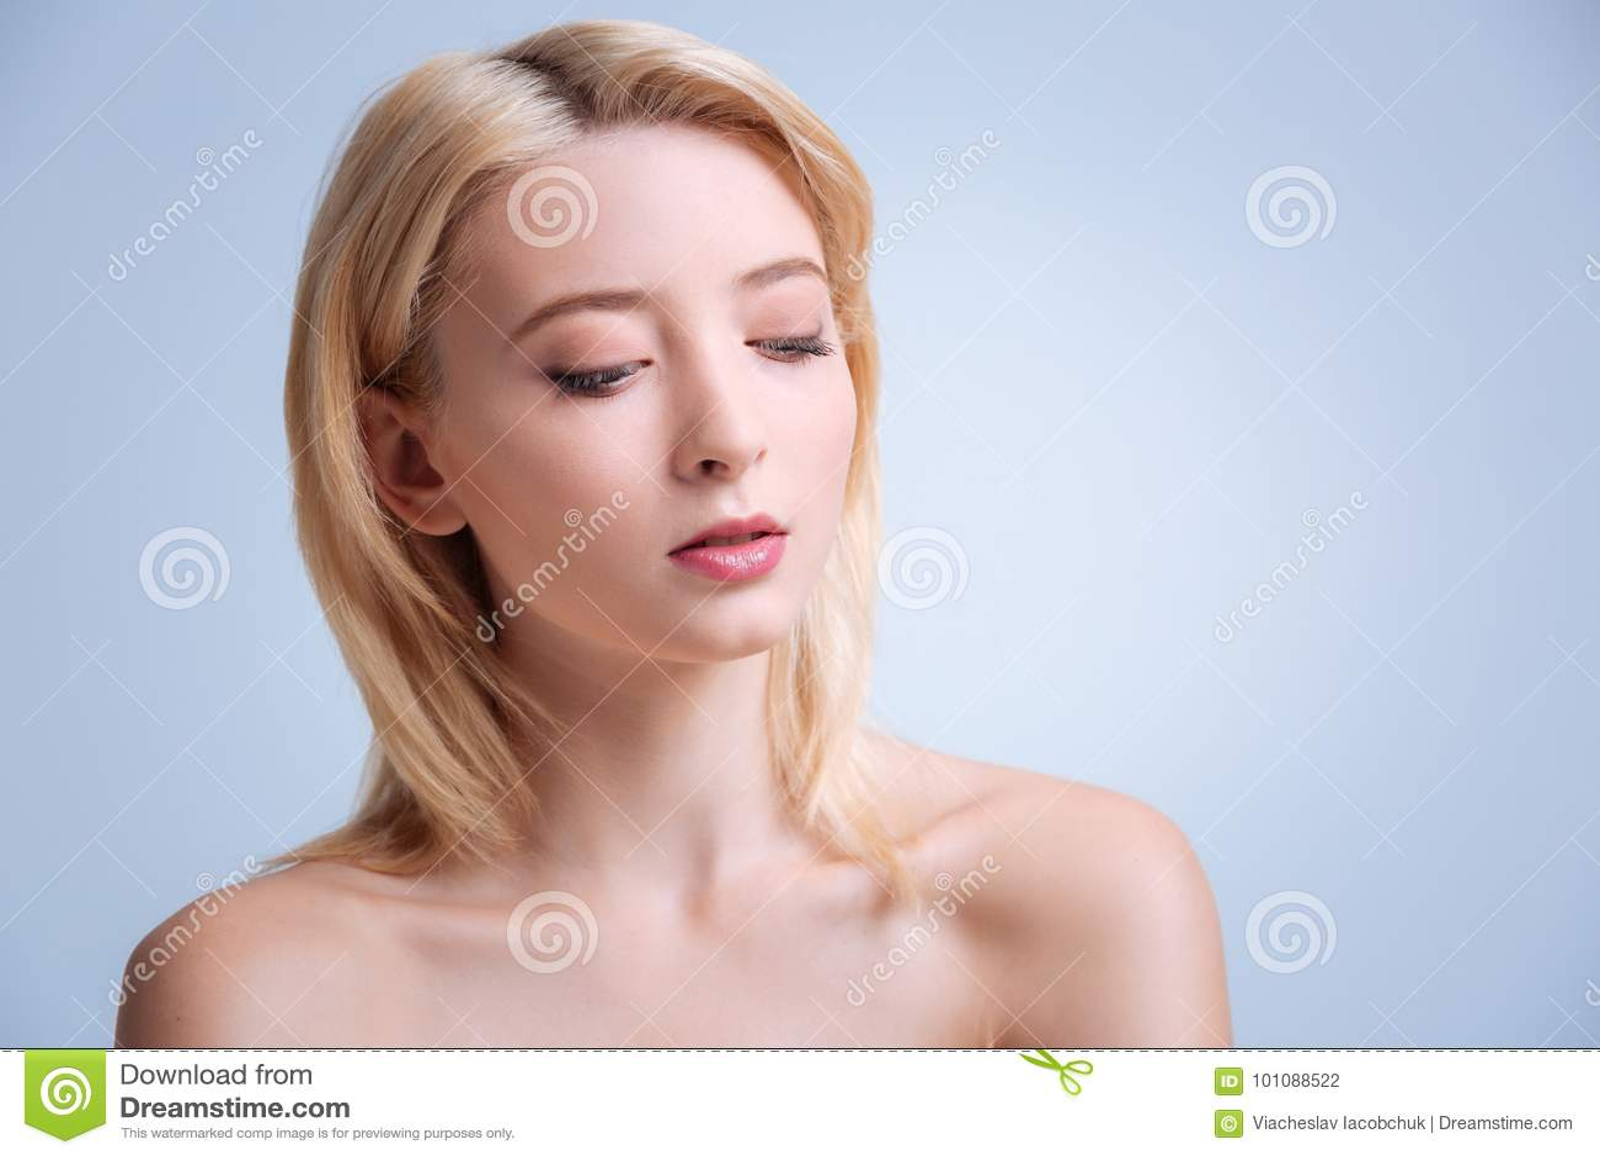 Christian nude posing wife